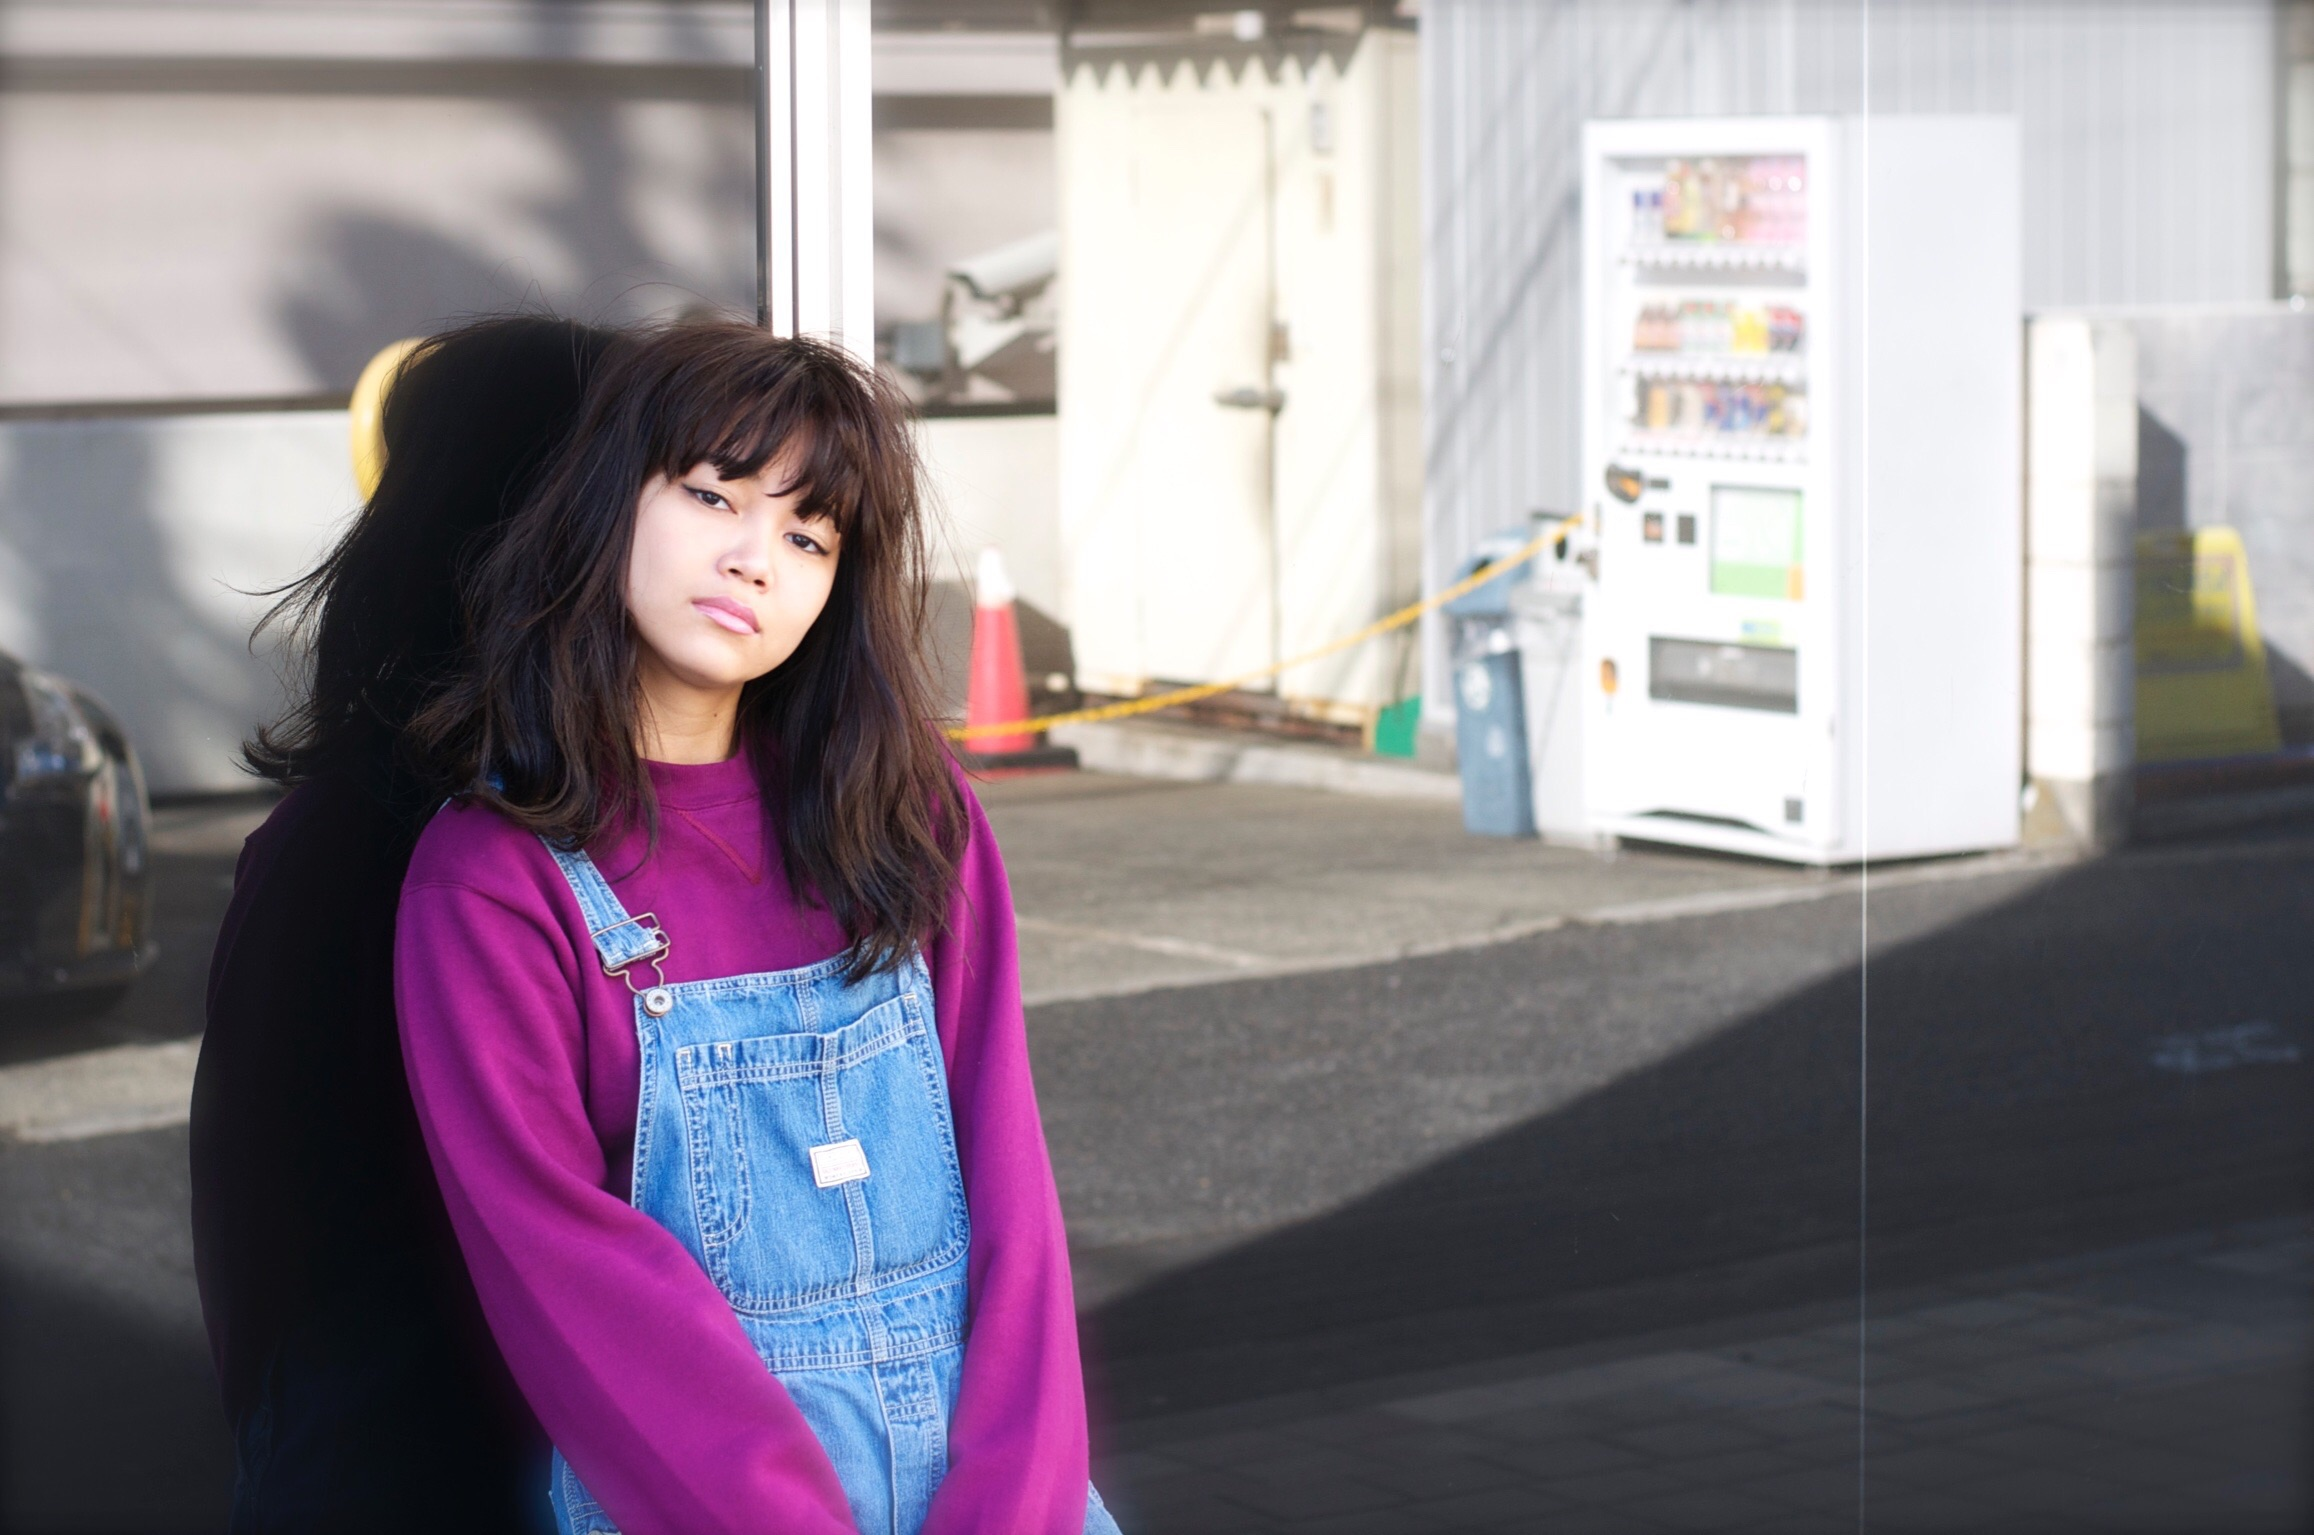 【第1回 NYLON JAPAN×HAIR CONTEST】絶賛開催中!エントリー作品公開中! 伊藤 美帆子 / DAMIAbyLuLu